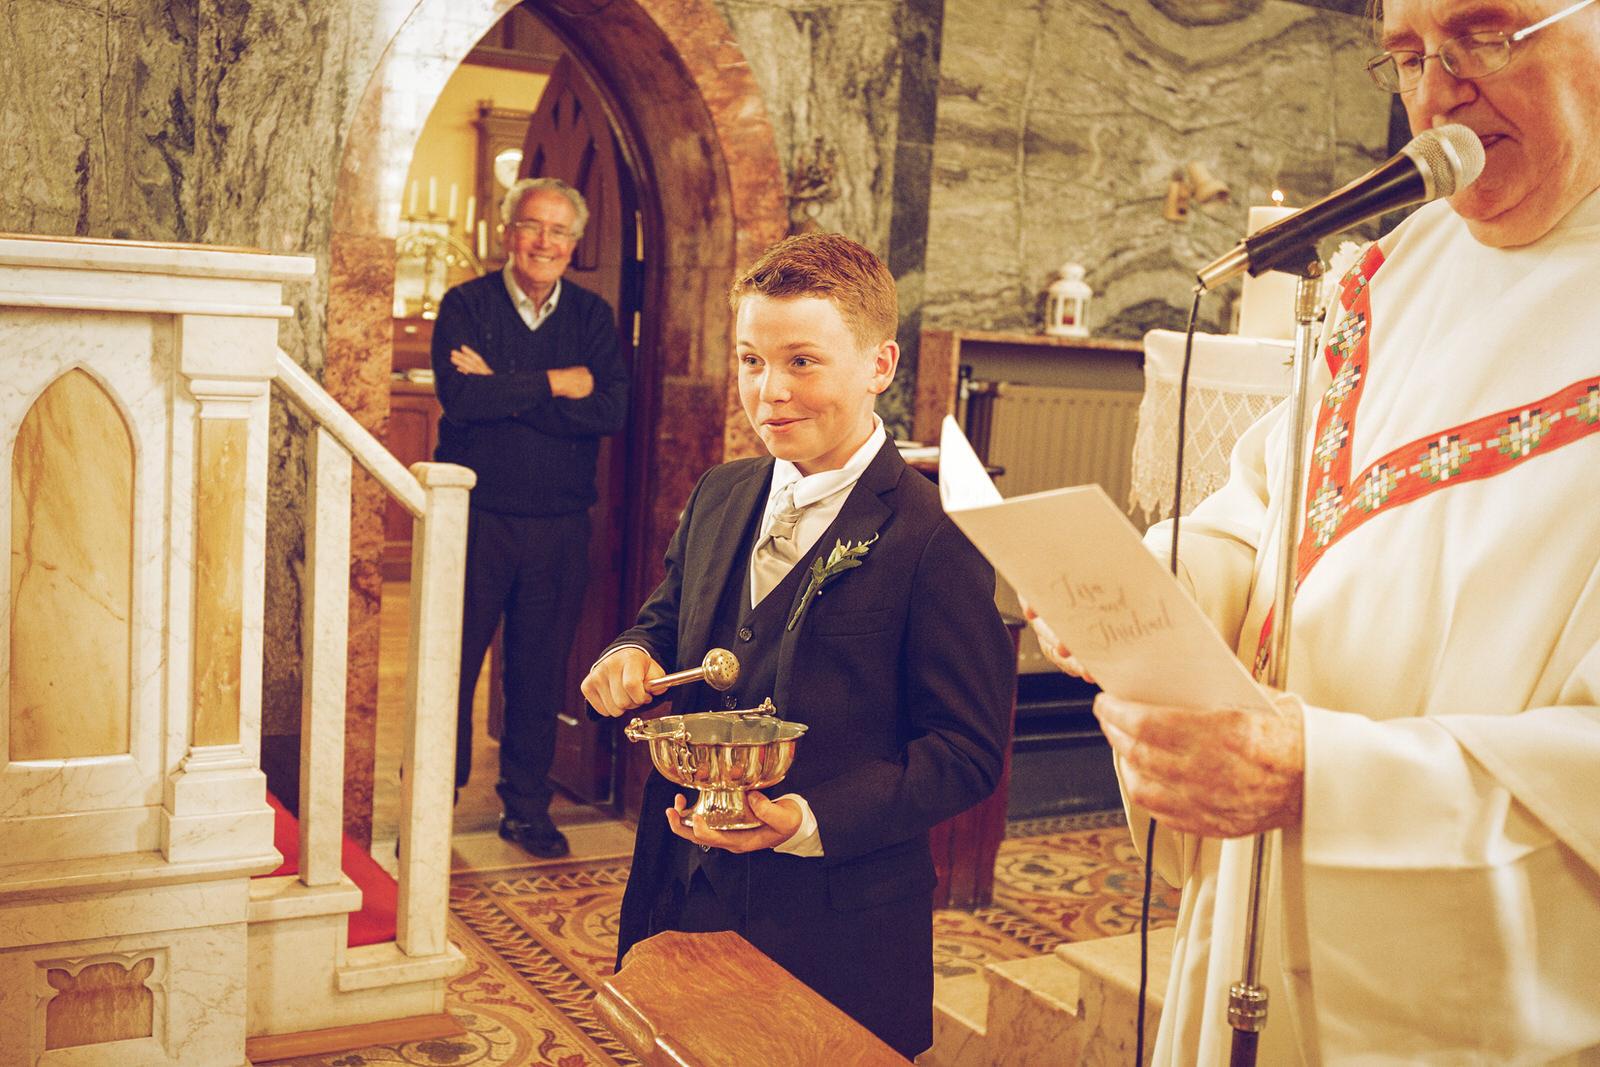 Brooklodge-wicklow-wedding-photographer_039.jpg